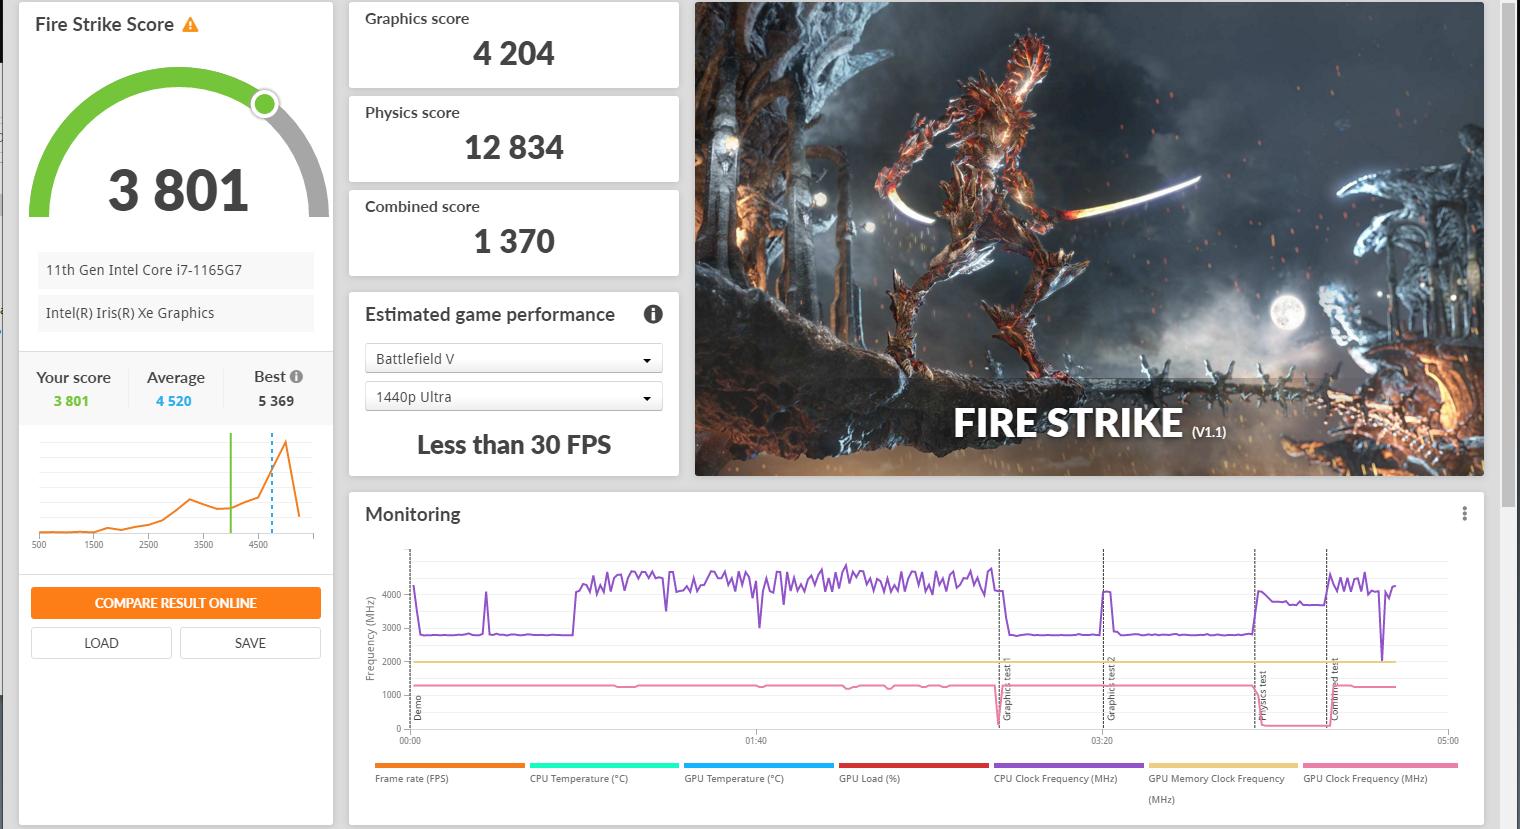 MOUSE「DAIV 4P」でFire Strike計測結果